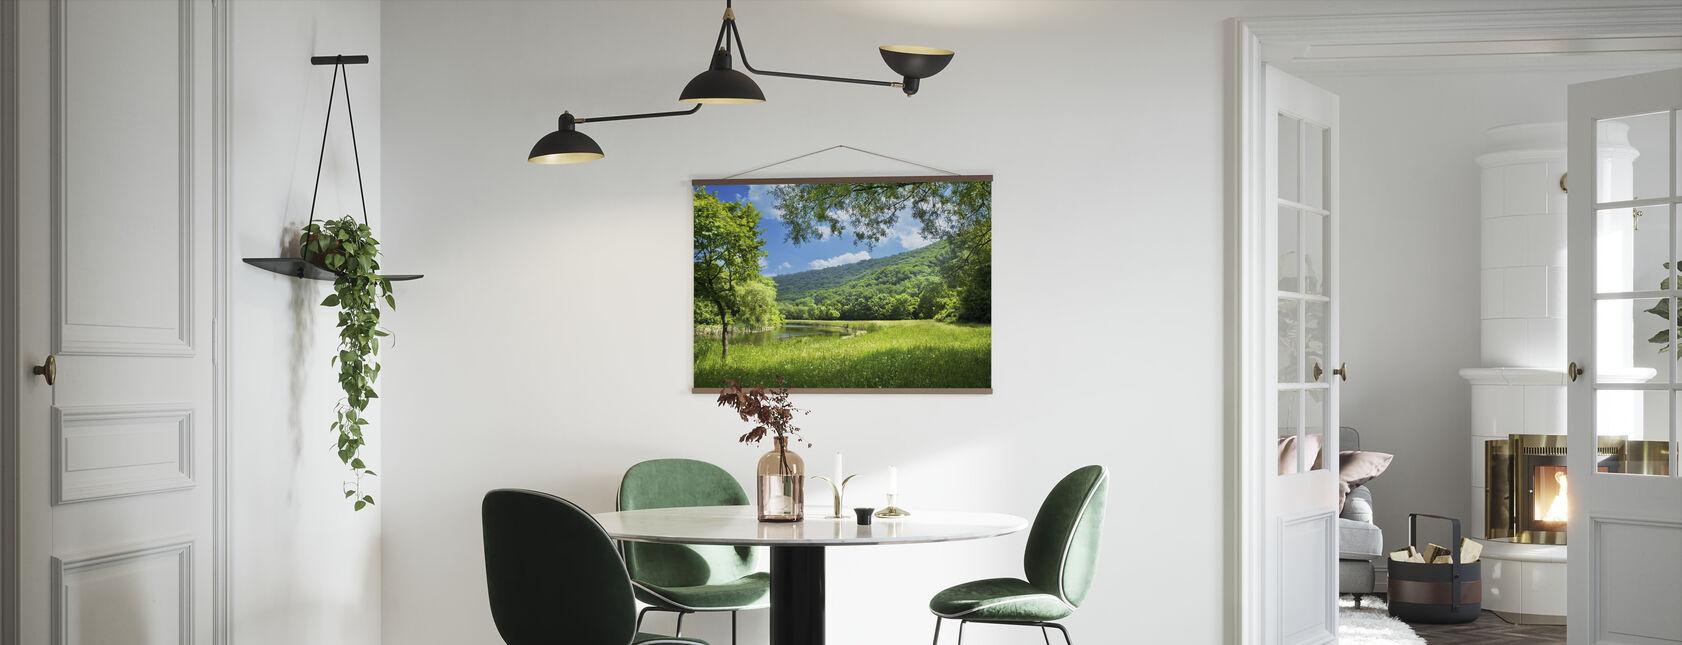 Summer Landscape with River - Poster - Kitchen